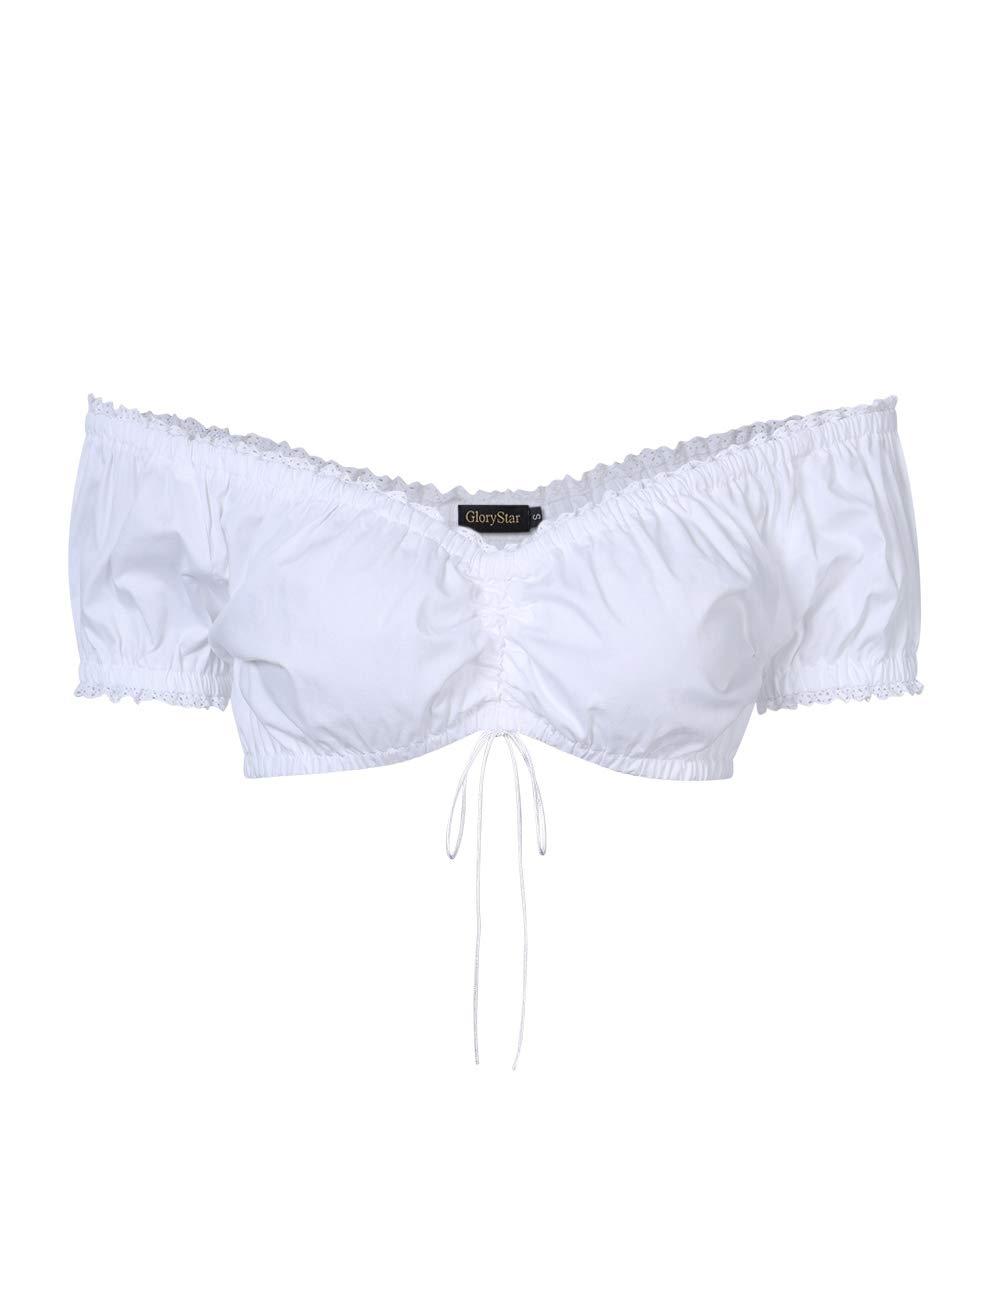 Leoie Glorystar Women's Bavarian Oktoberfest Tube Top Barmaid Fitted Costume Shirt White 2XL